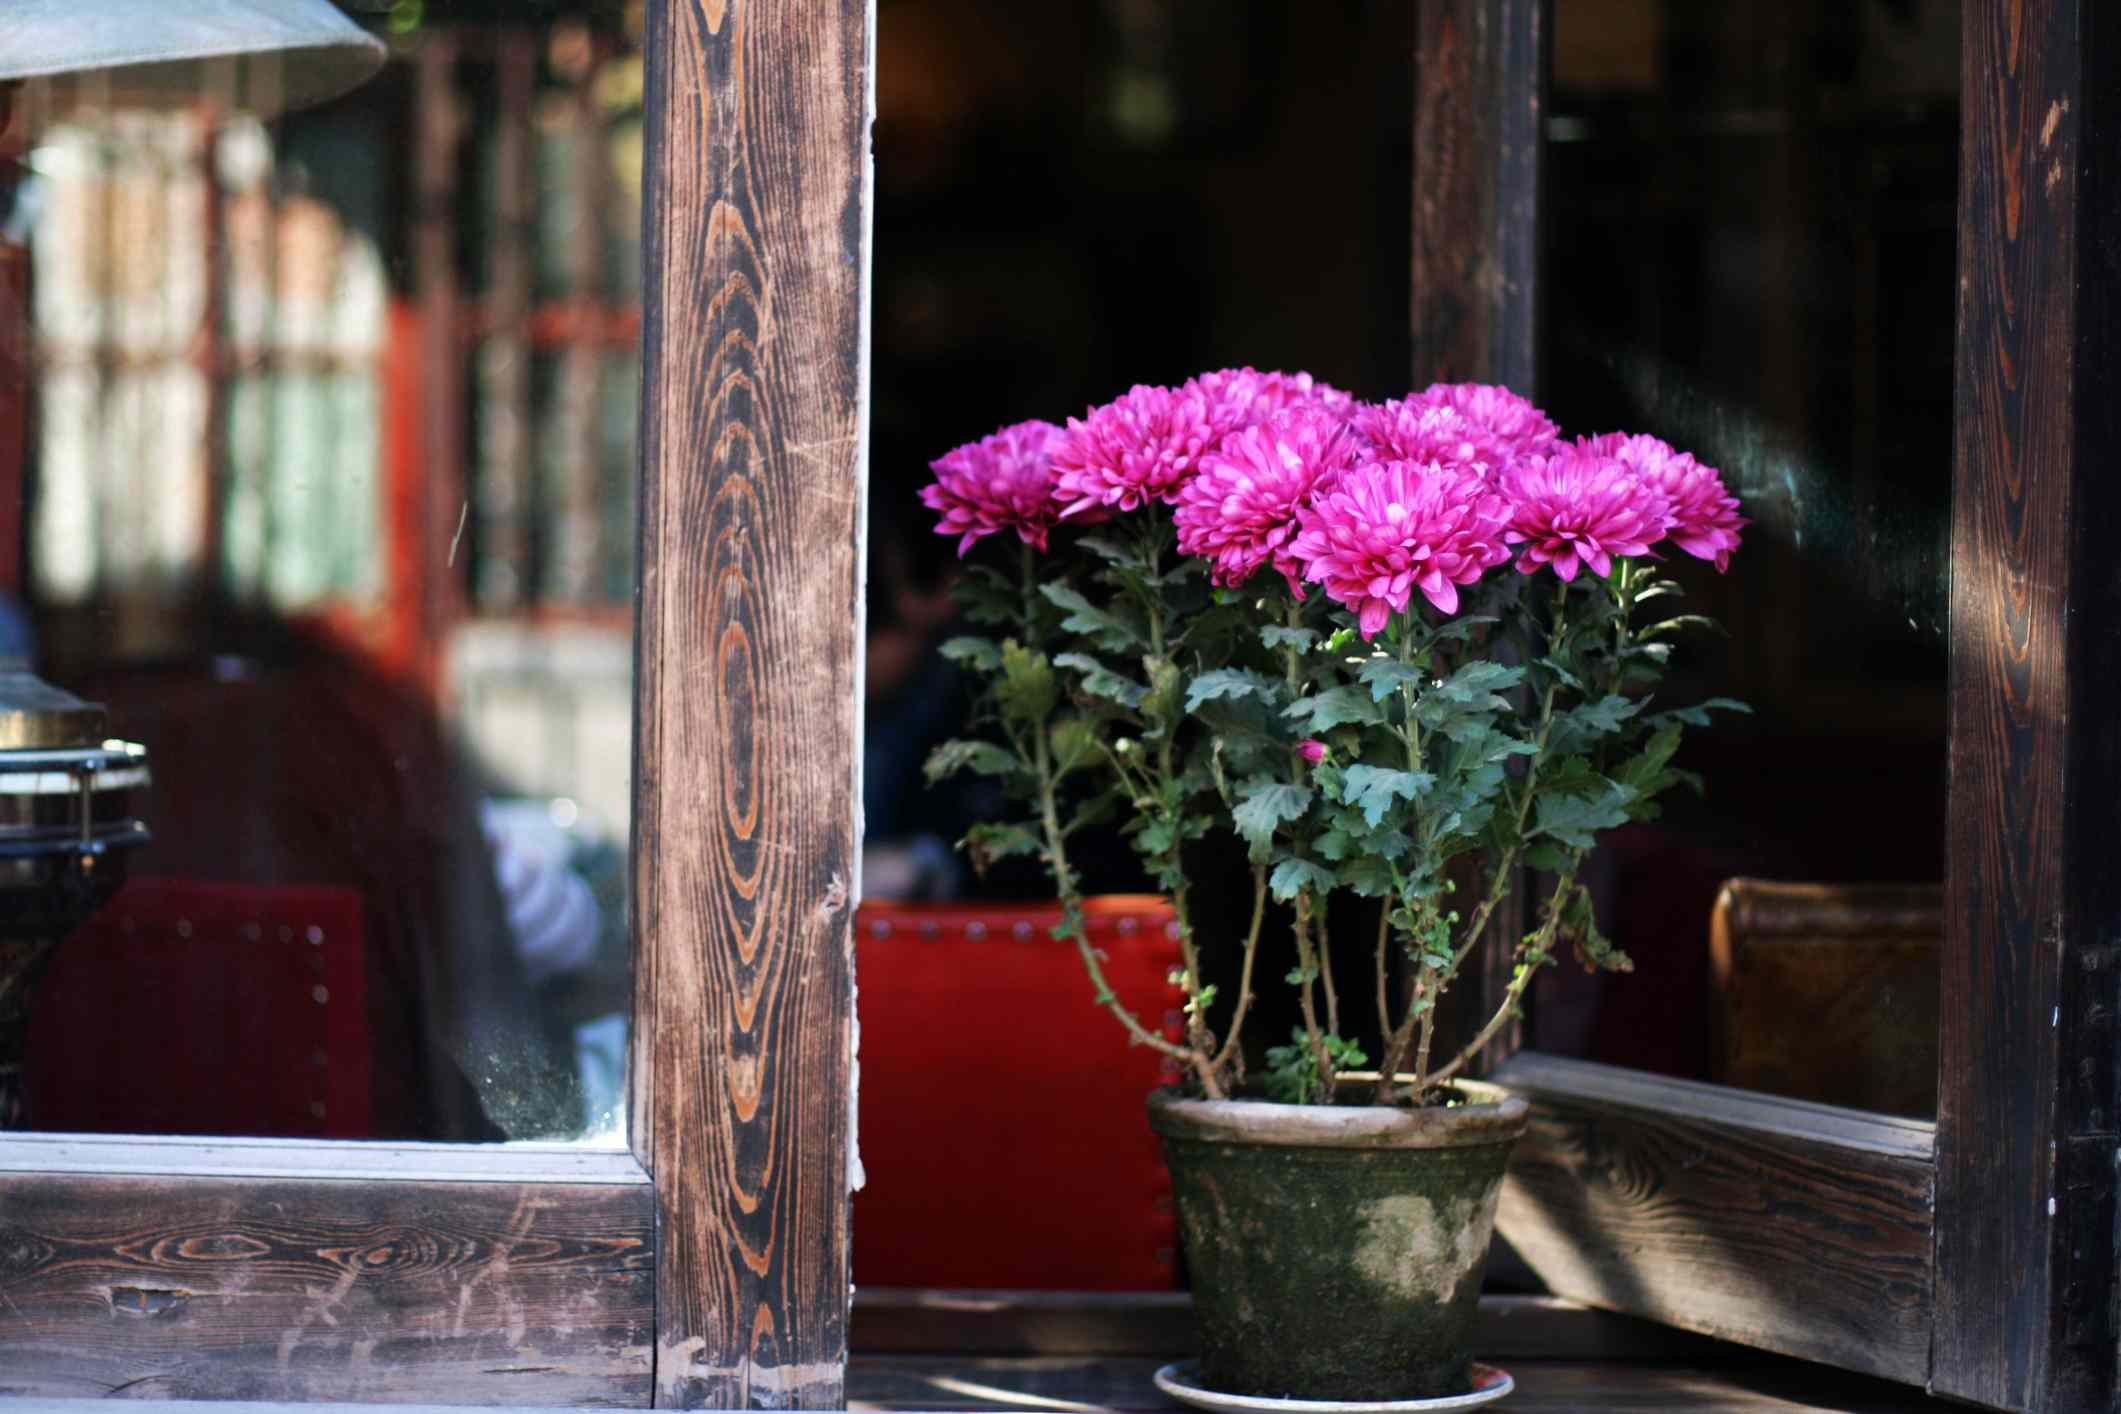 Pink chrysanthemum in an open window